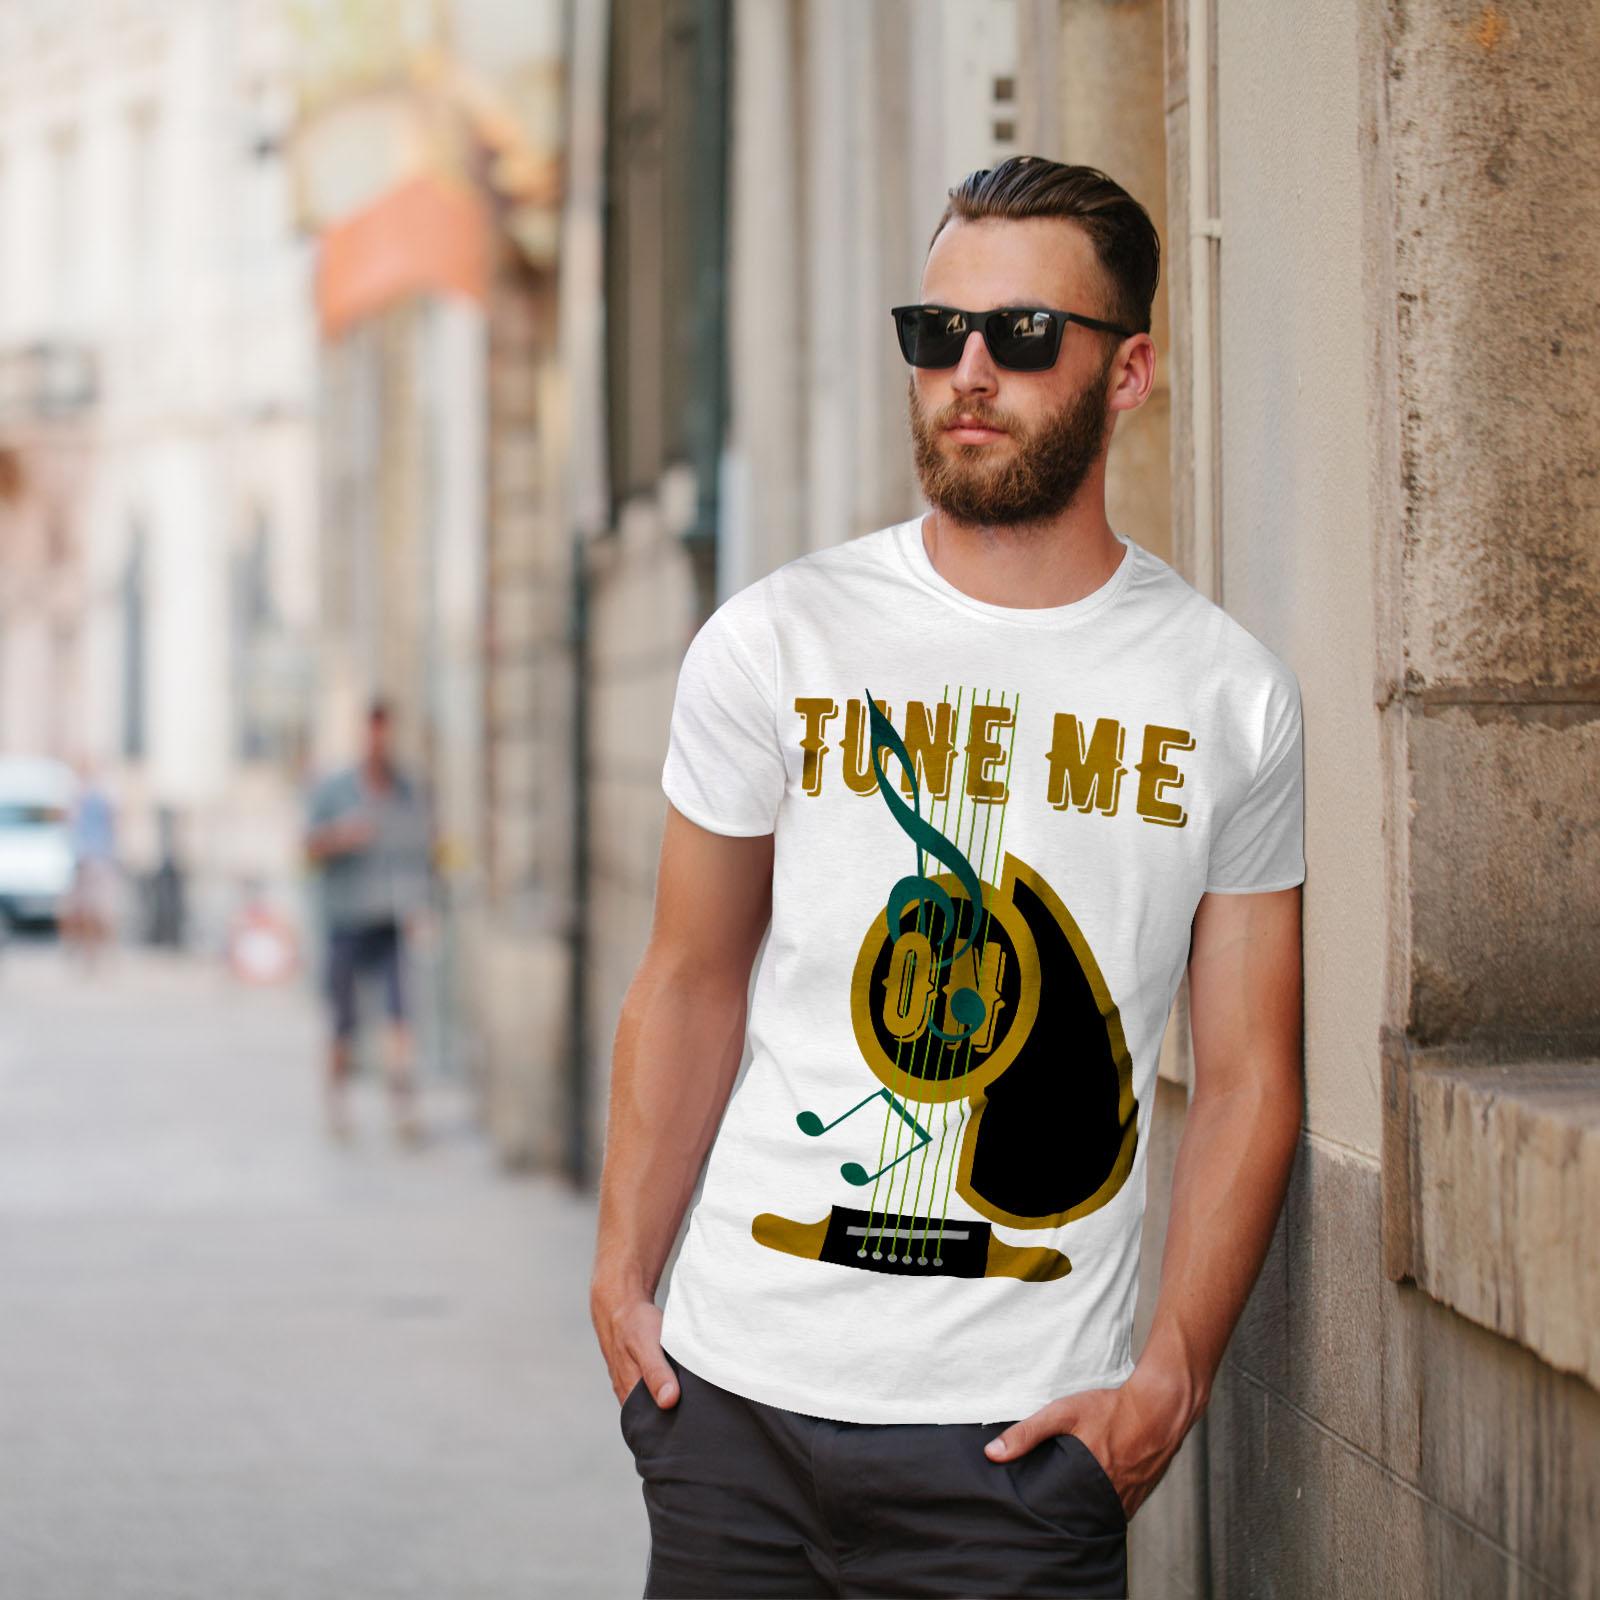 Wellcoda Tune Me On Guitar Mens T-shirt Guitar Graphic Design Printed Tee